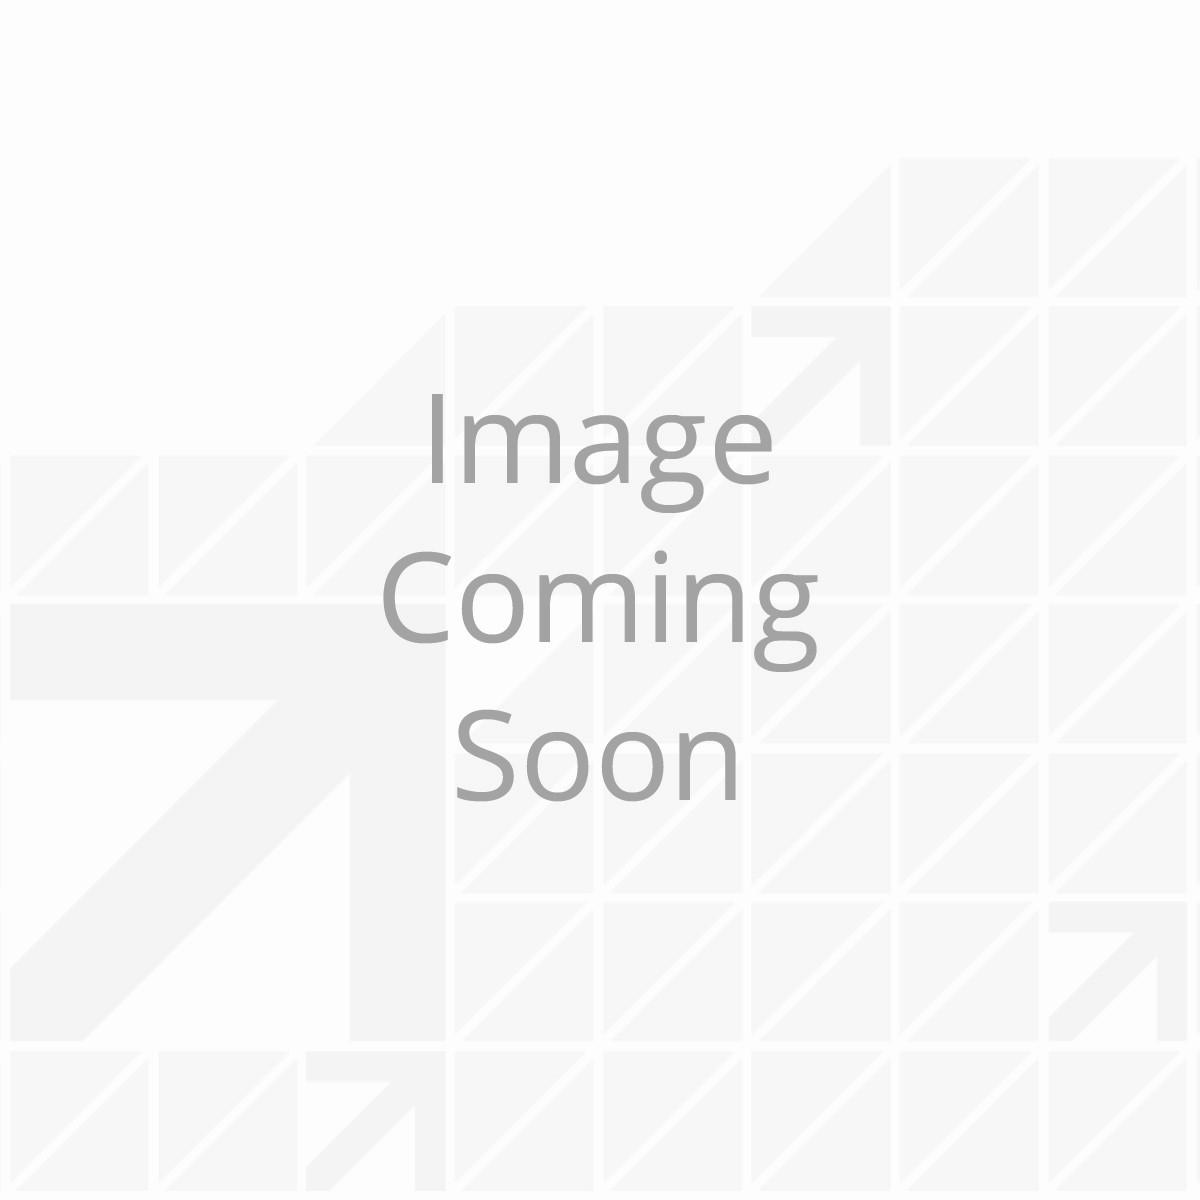 Trunnion Bar Weight Distribution Hardware Kit